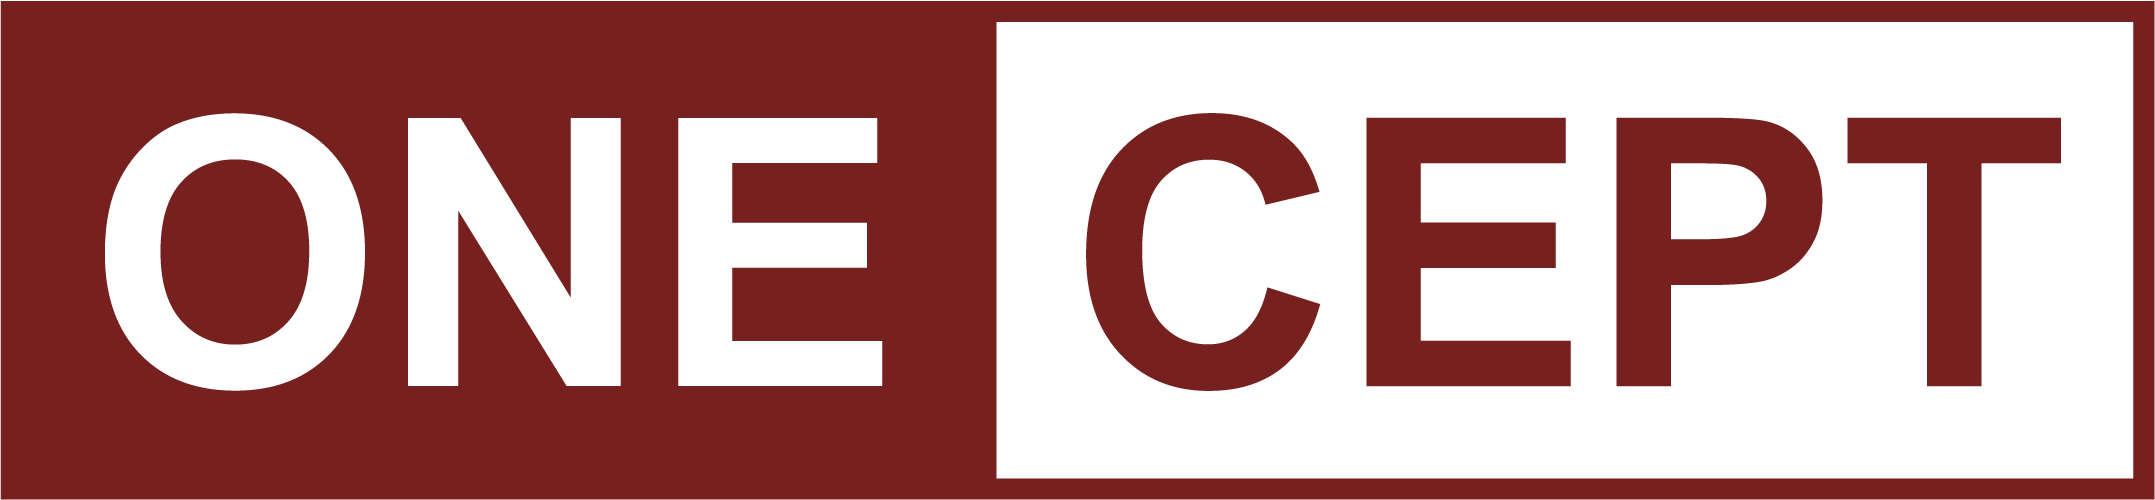 Onecept GmbH